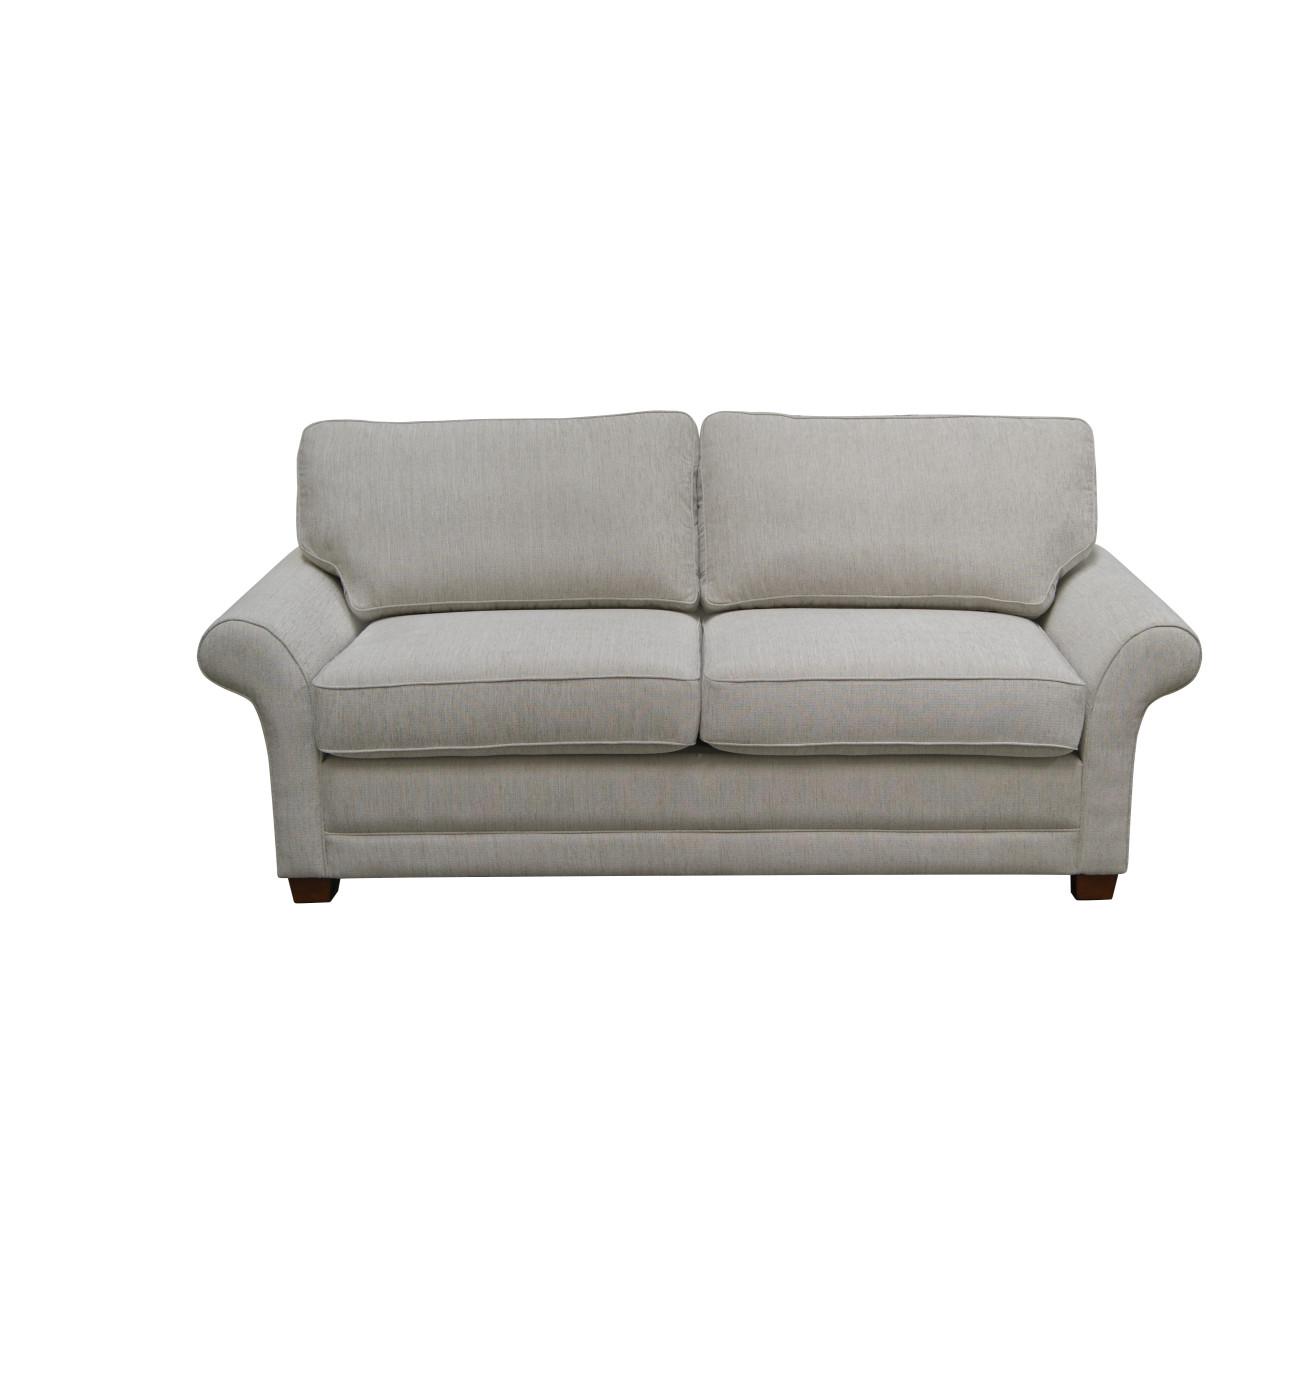 Sofas david jones baxter double sofa bed bendigo linen parisarafo Image collections